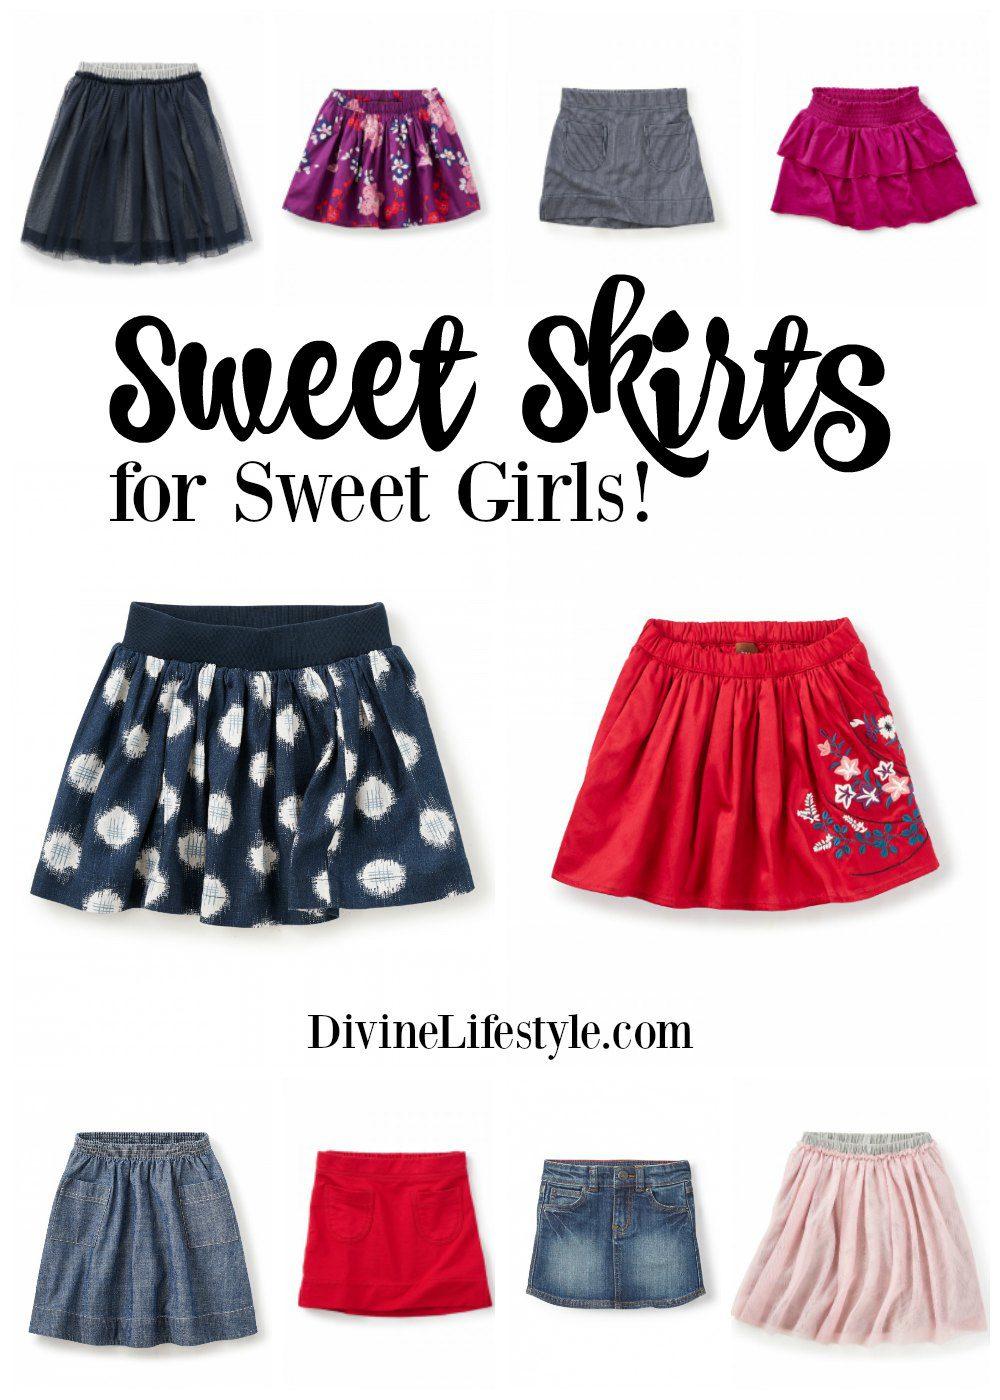 Sweet Skirts for Sweet Girls